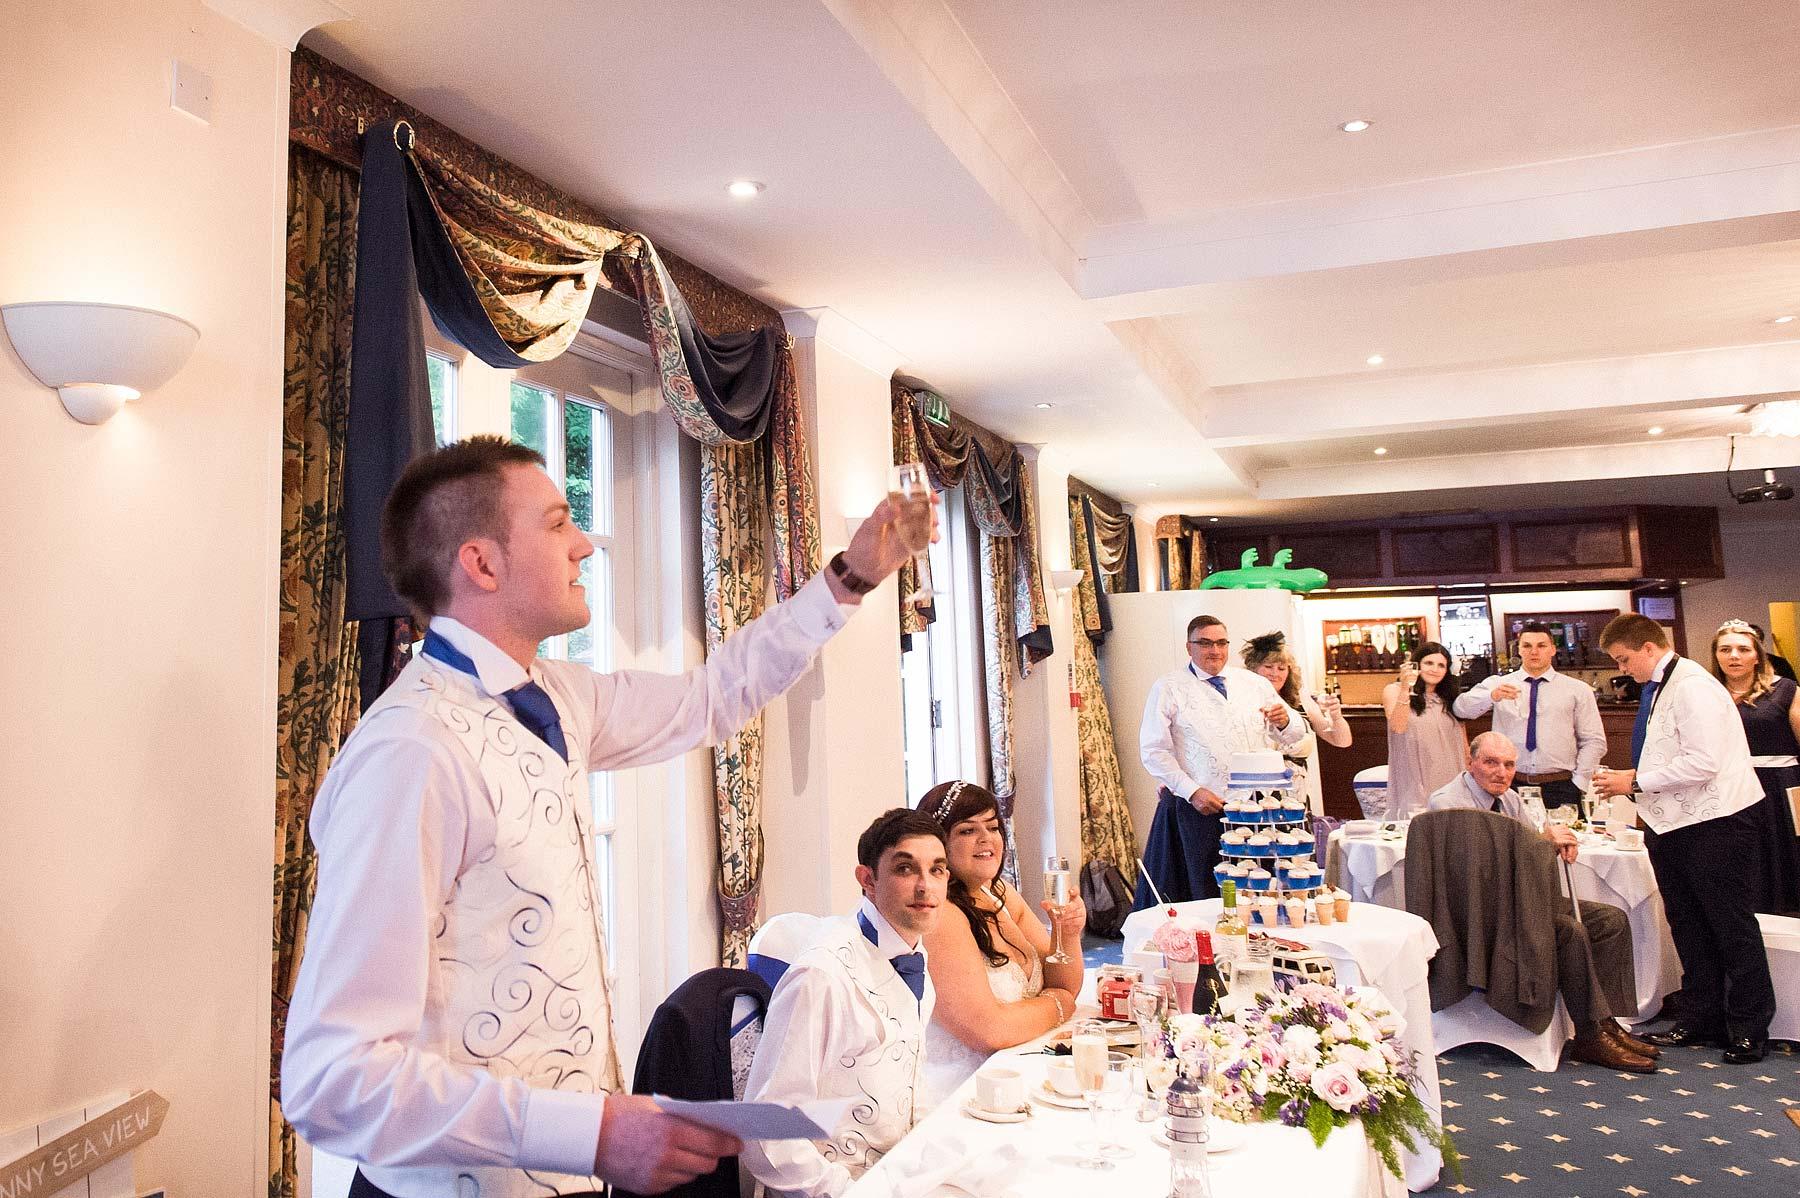 berry-head-hotel-brixham-wedding-photographer-094